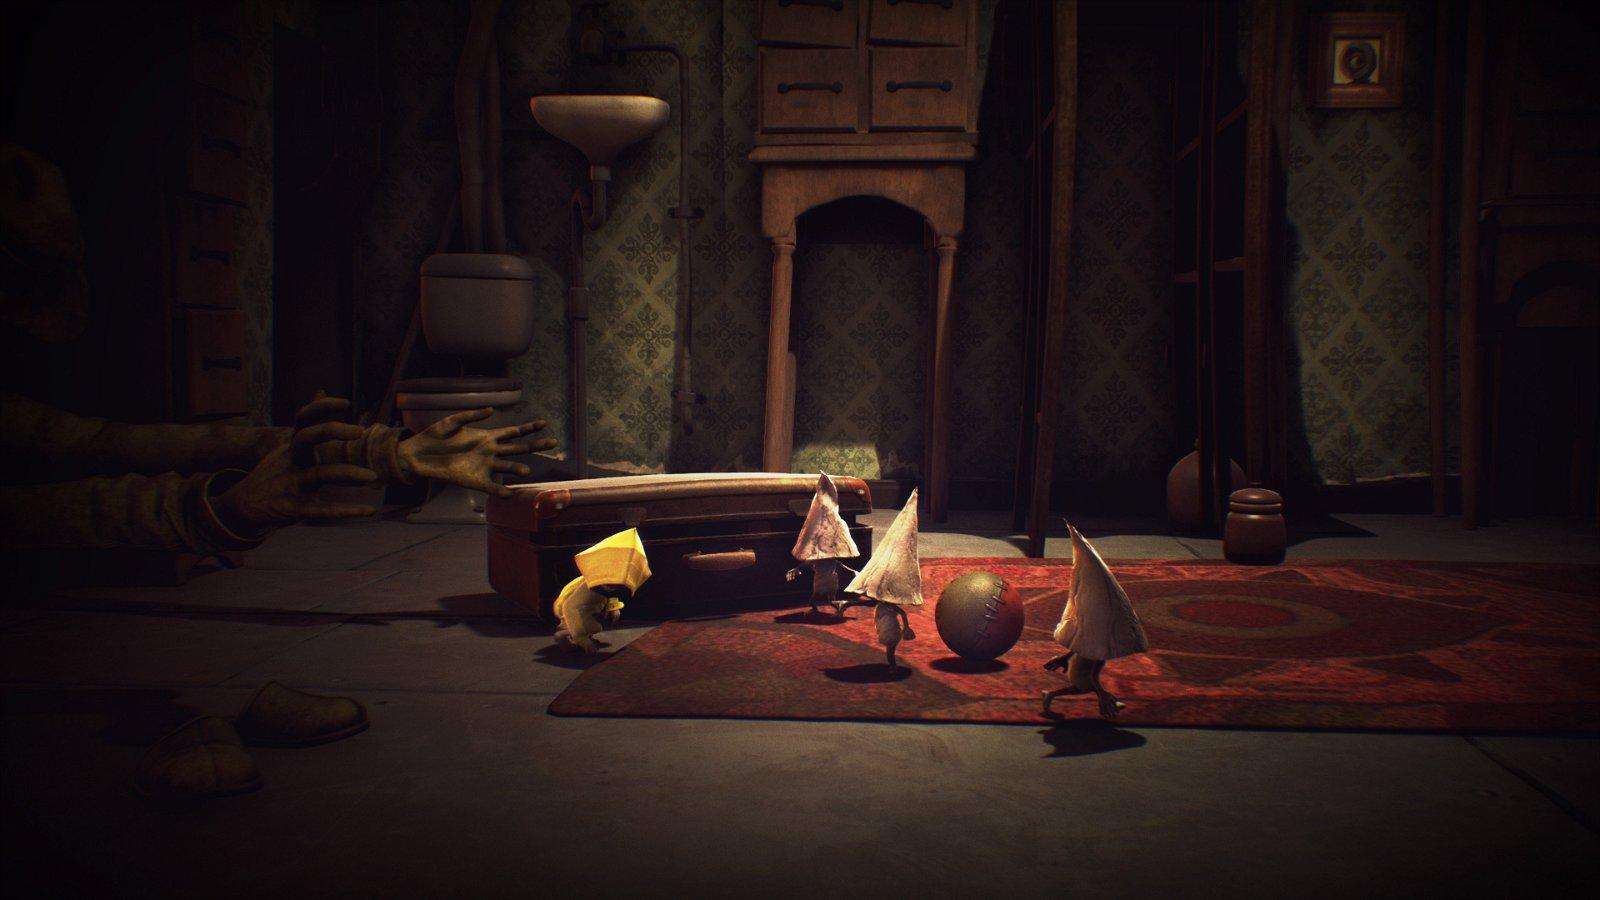 Little Nightmares recibe un DLC con una historia alternativa